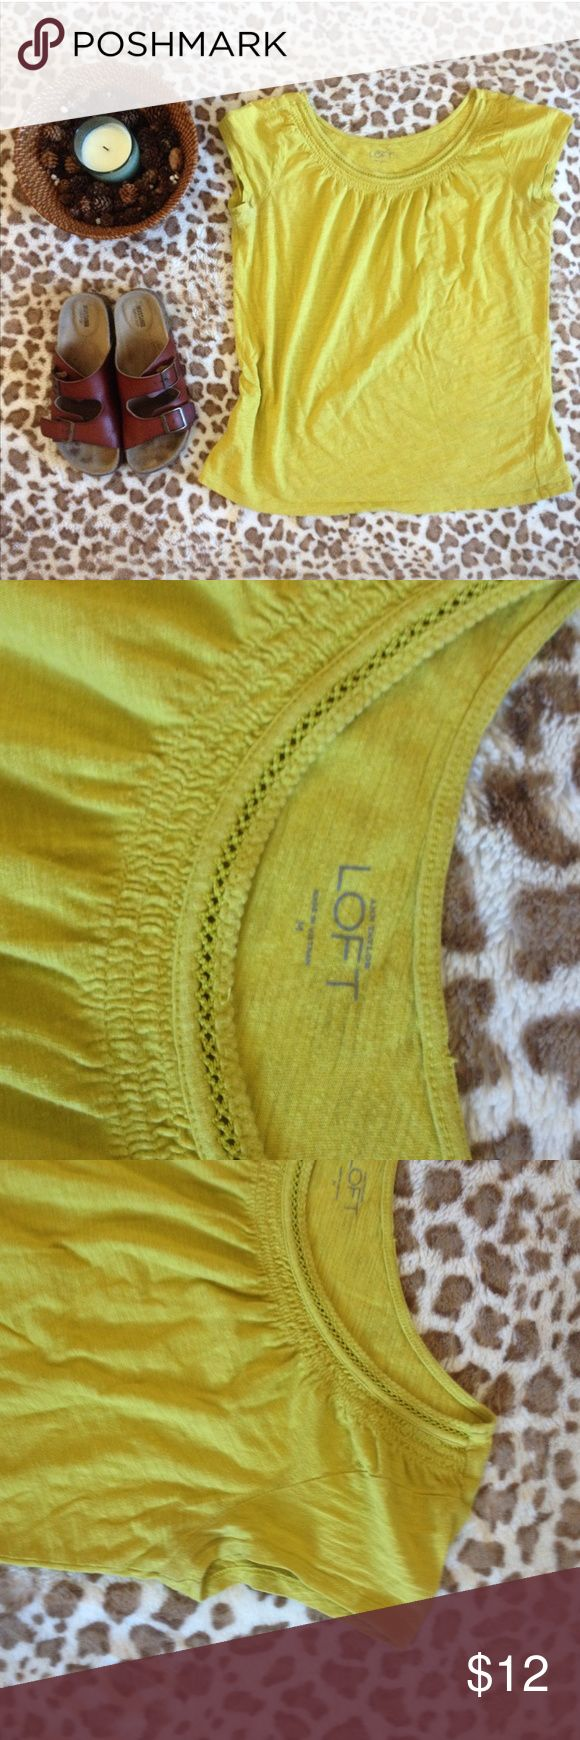 LOFT Lime Green Neckline Detail Tee Shirt Short sleeve tee by Ann Taylor loft lime green LOFT Tops Tees - Short Sleeve